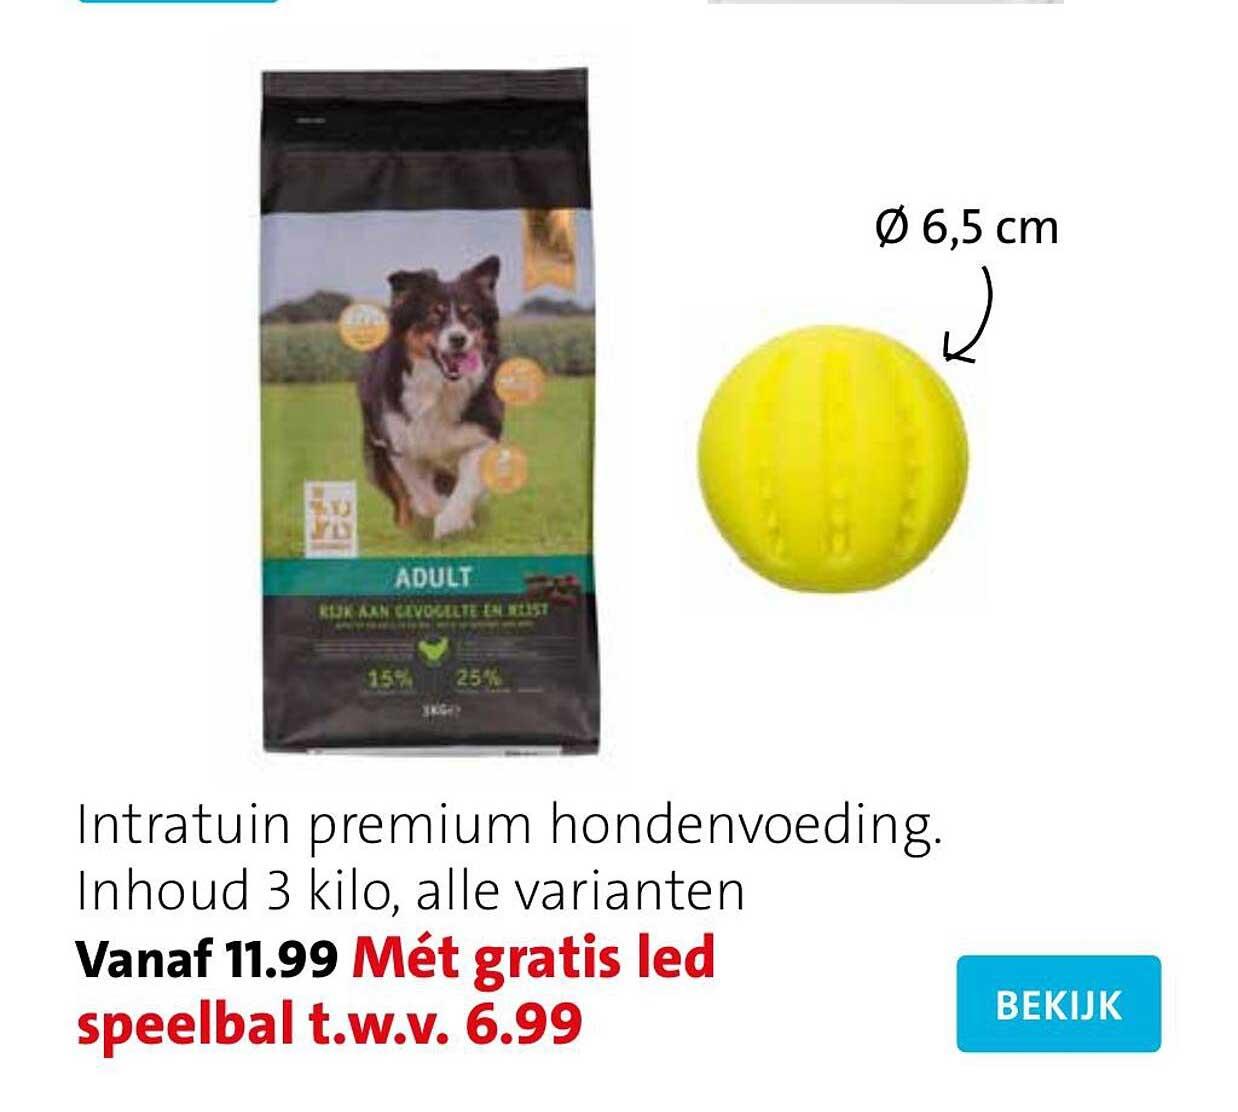 Intratuin Intratuin Premium Hondenvoeding